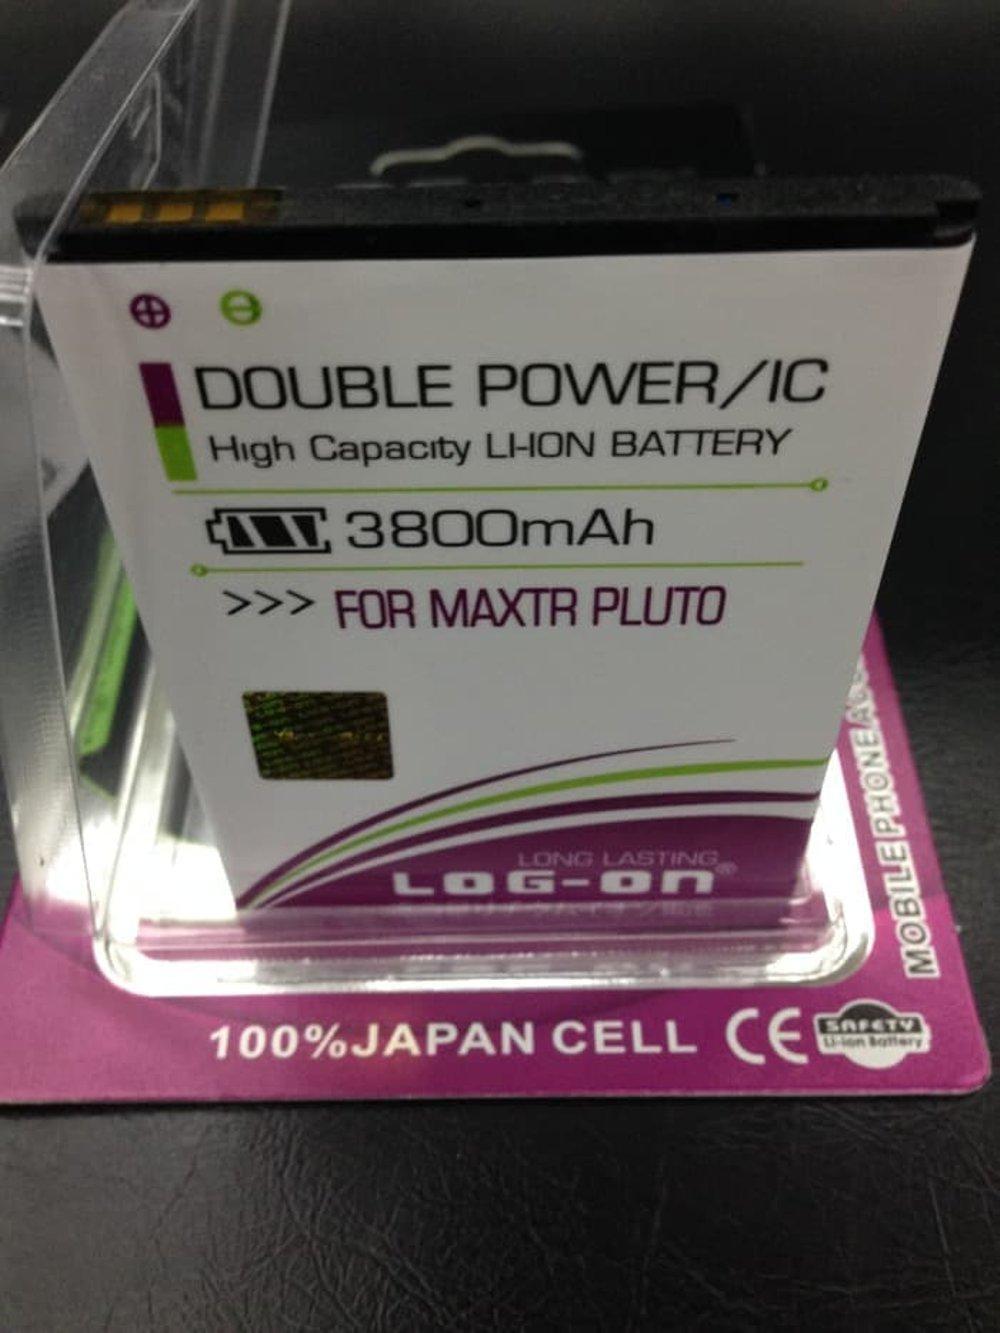 Jual Maxtron V7 Murah Garansi Dan Berkualitas Id Store New7a Smartphone Rp 90000